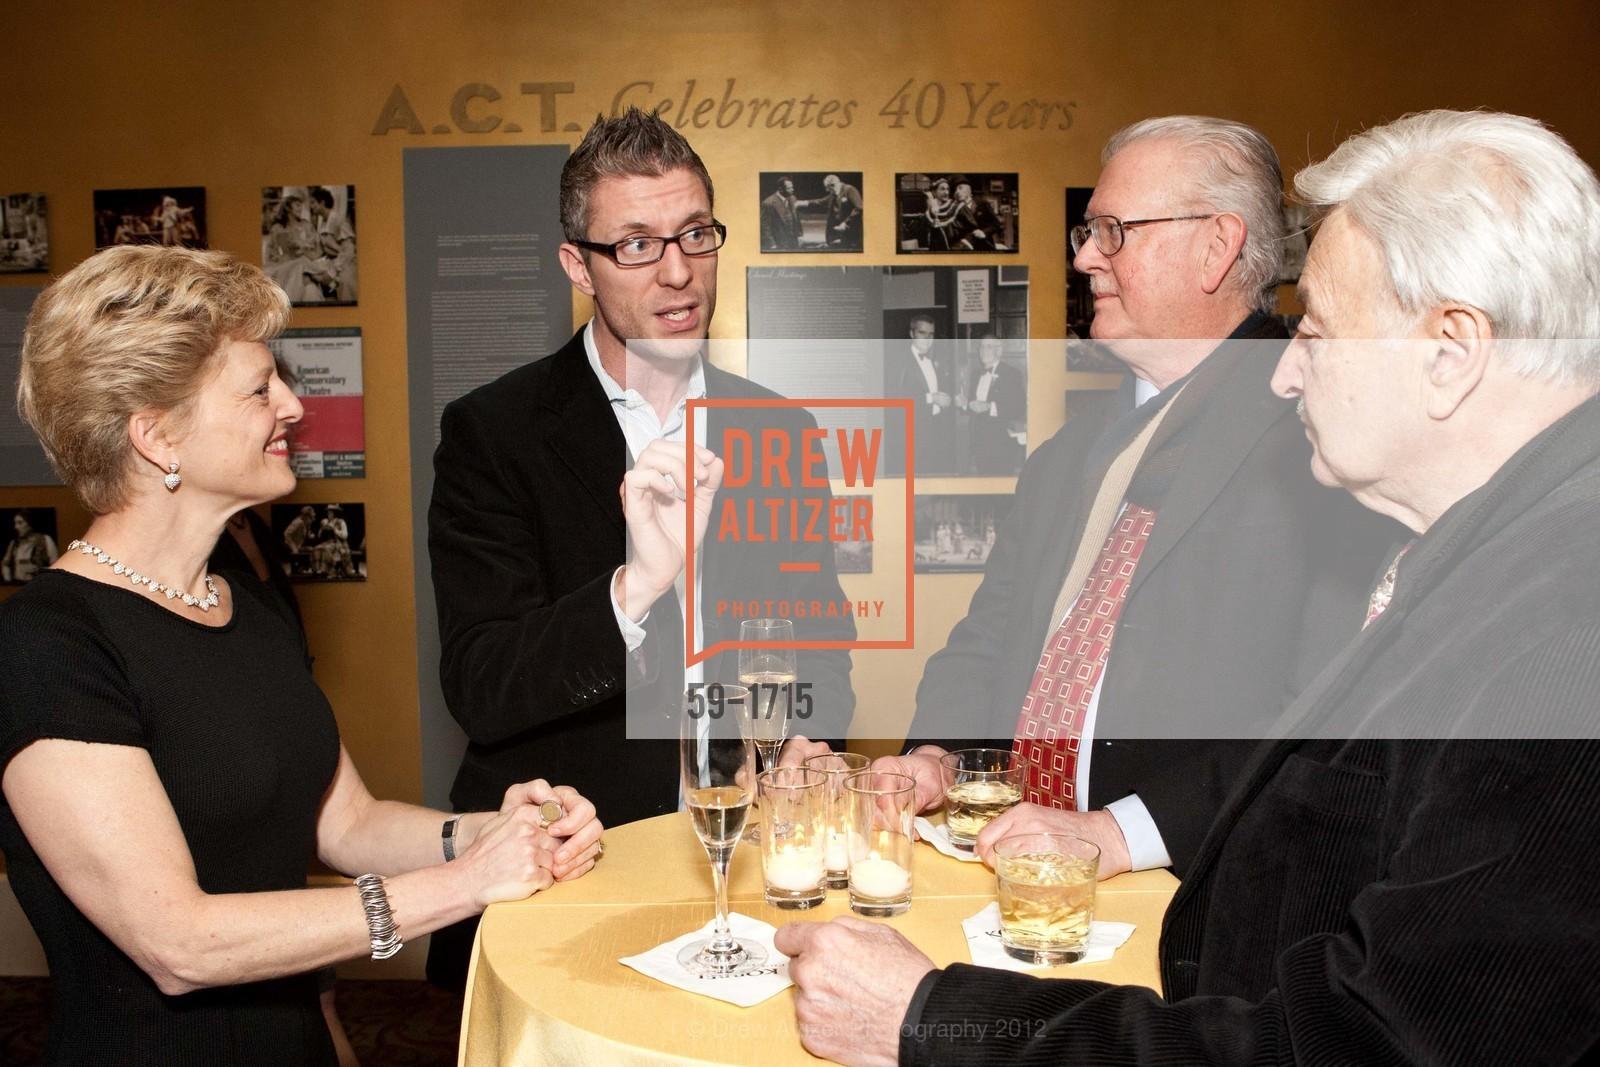 Carey Perloff, Lorenzo Thione, Tom Foutch, Milton Mosk, Photo #59-1715